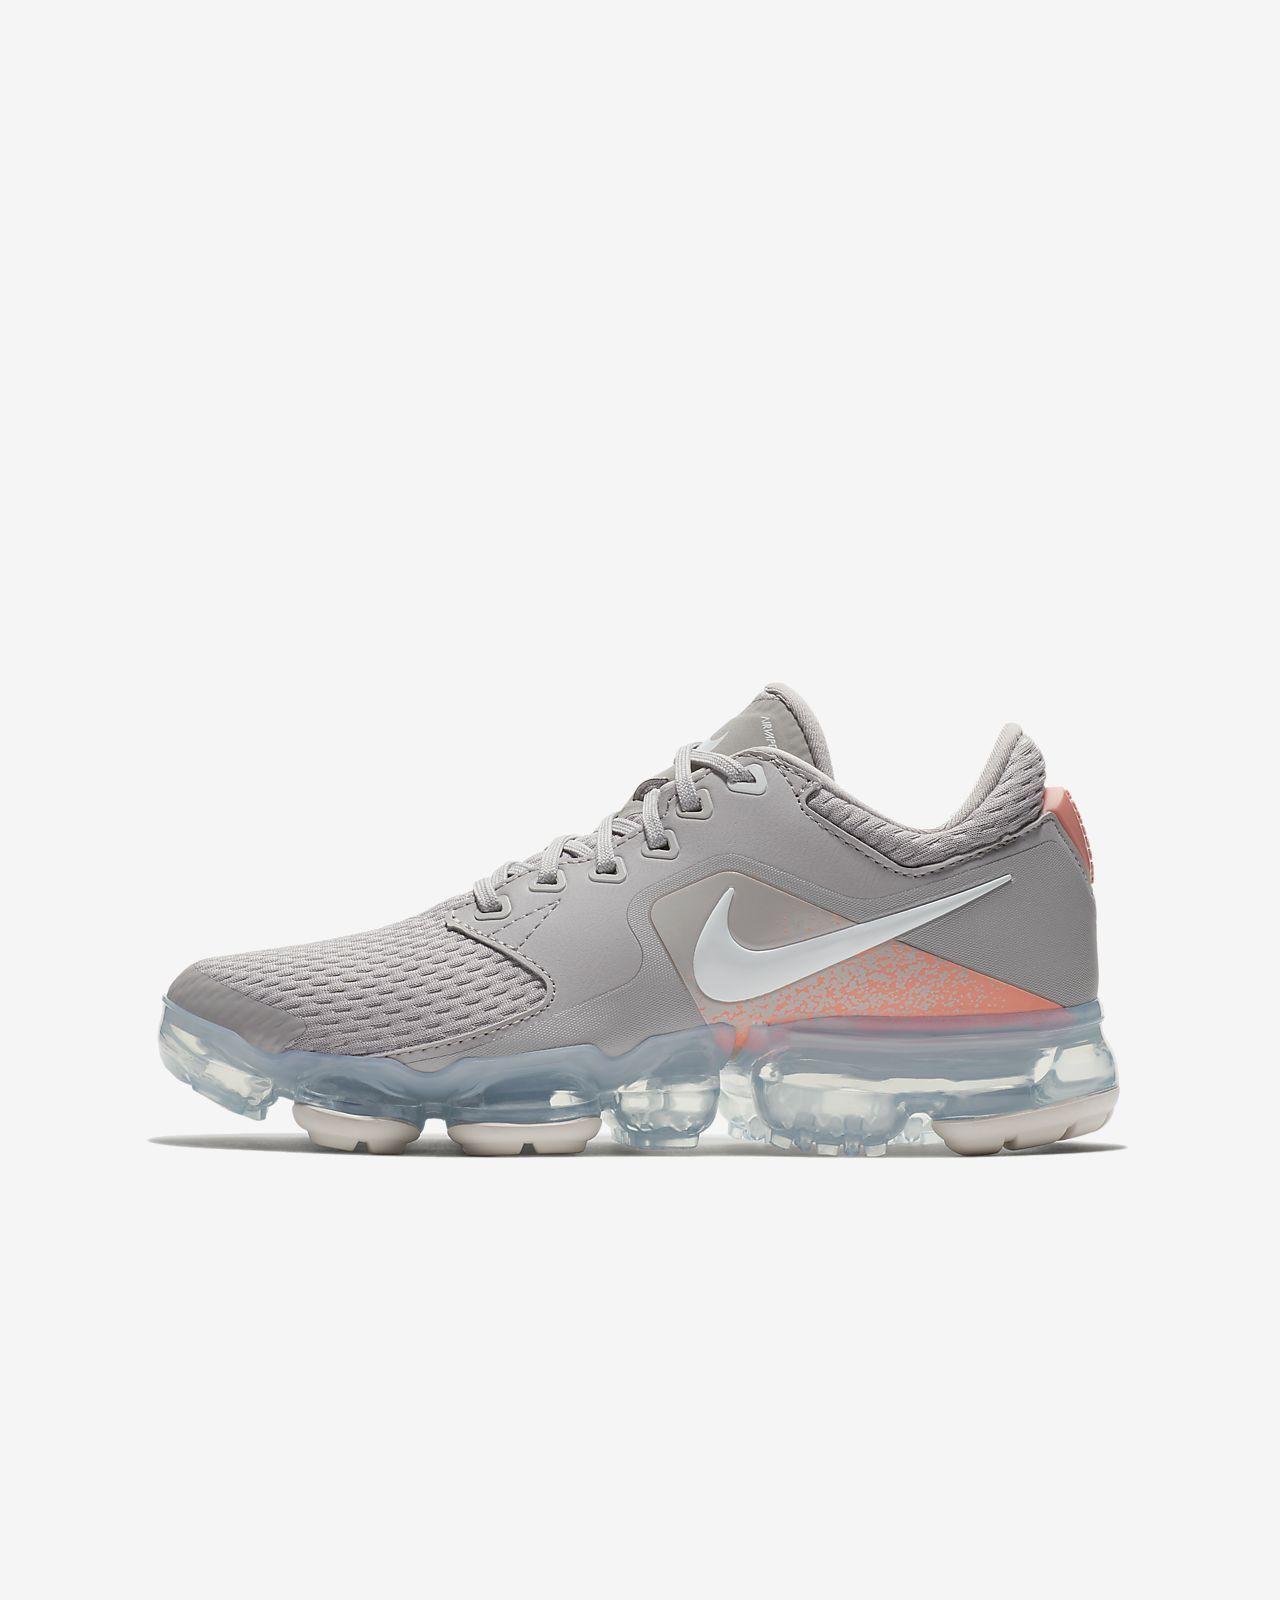 eaaabb5e2148 Big Kids  Nike Air VaporMax Running Shoe Atmosphere Grey Vast Grey Crimson  Pulse White - 917962-008